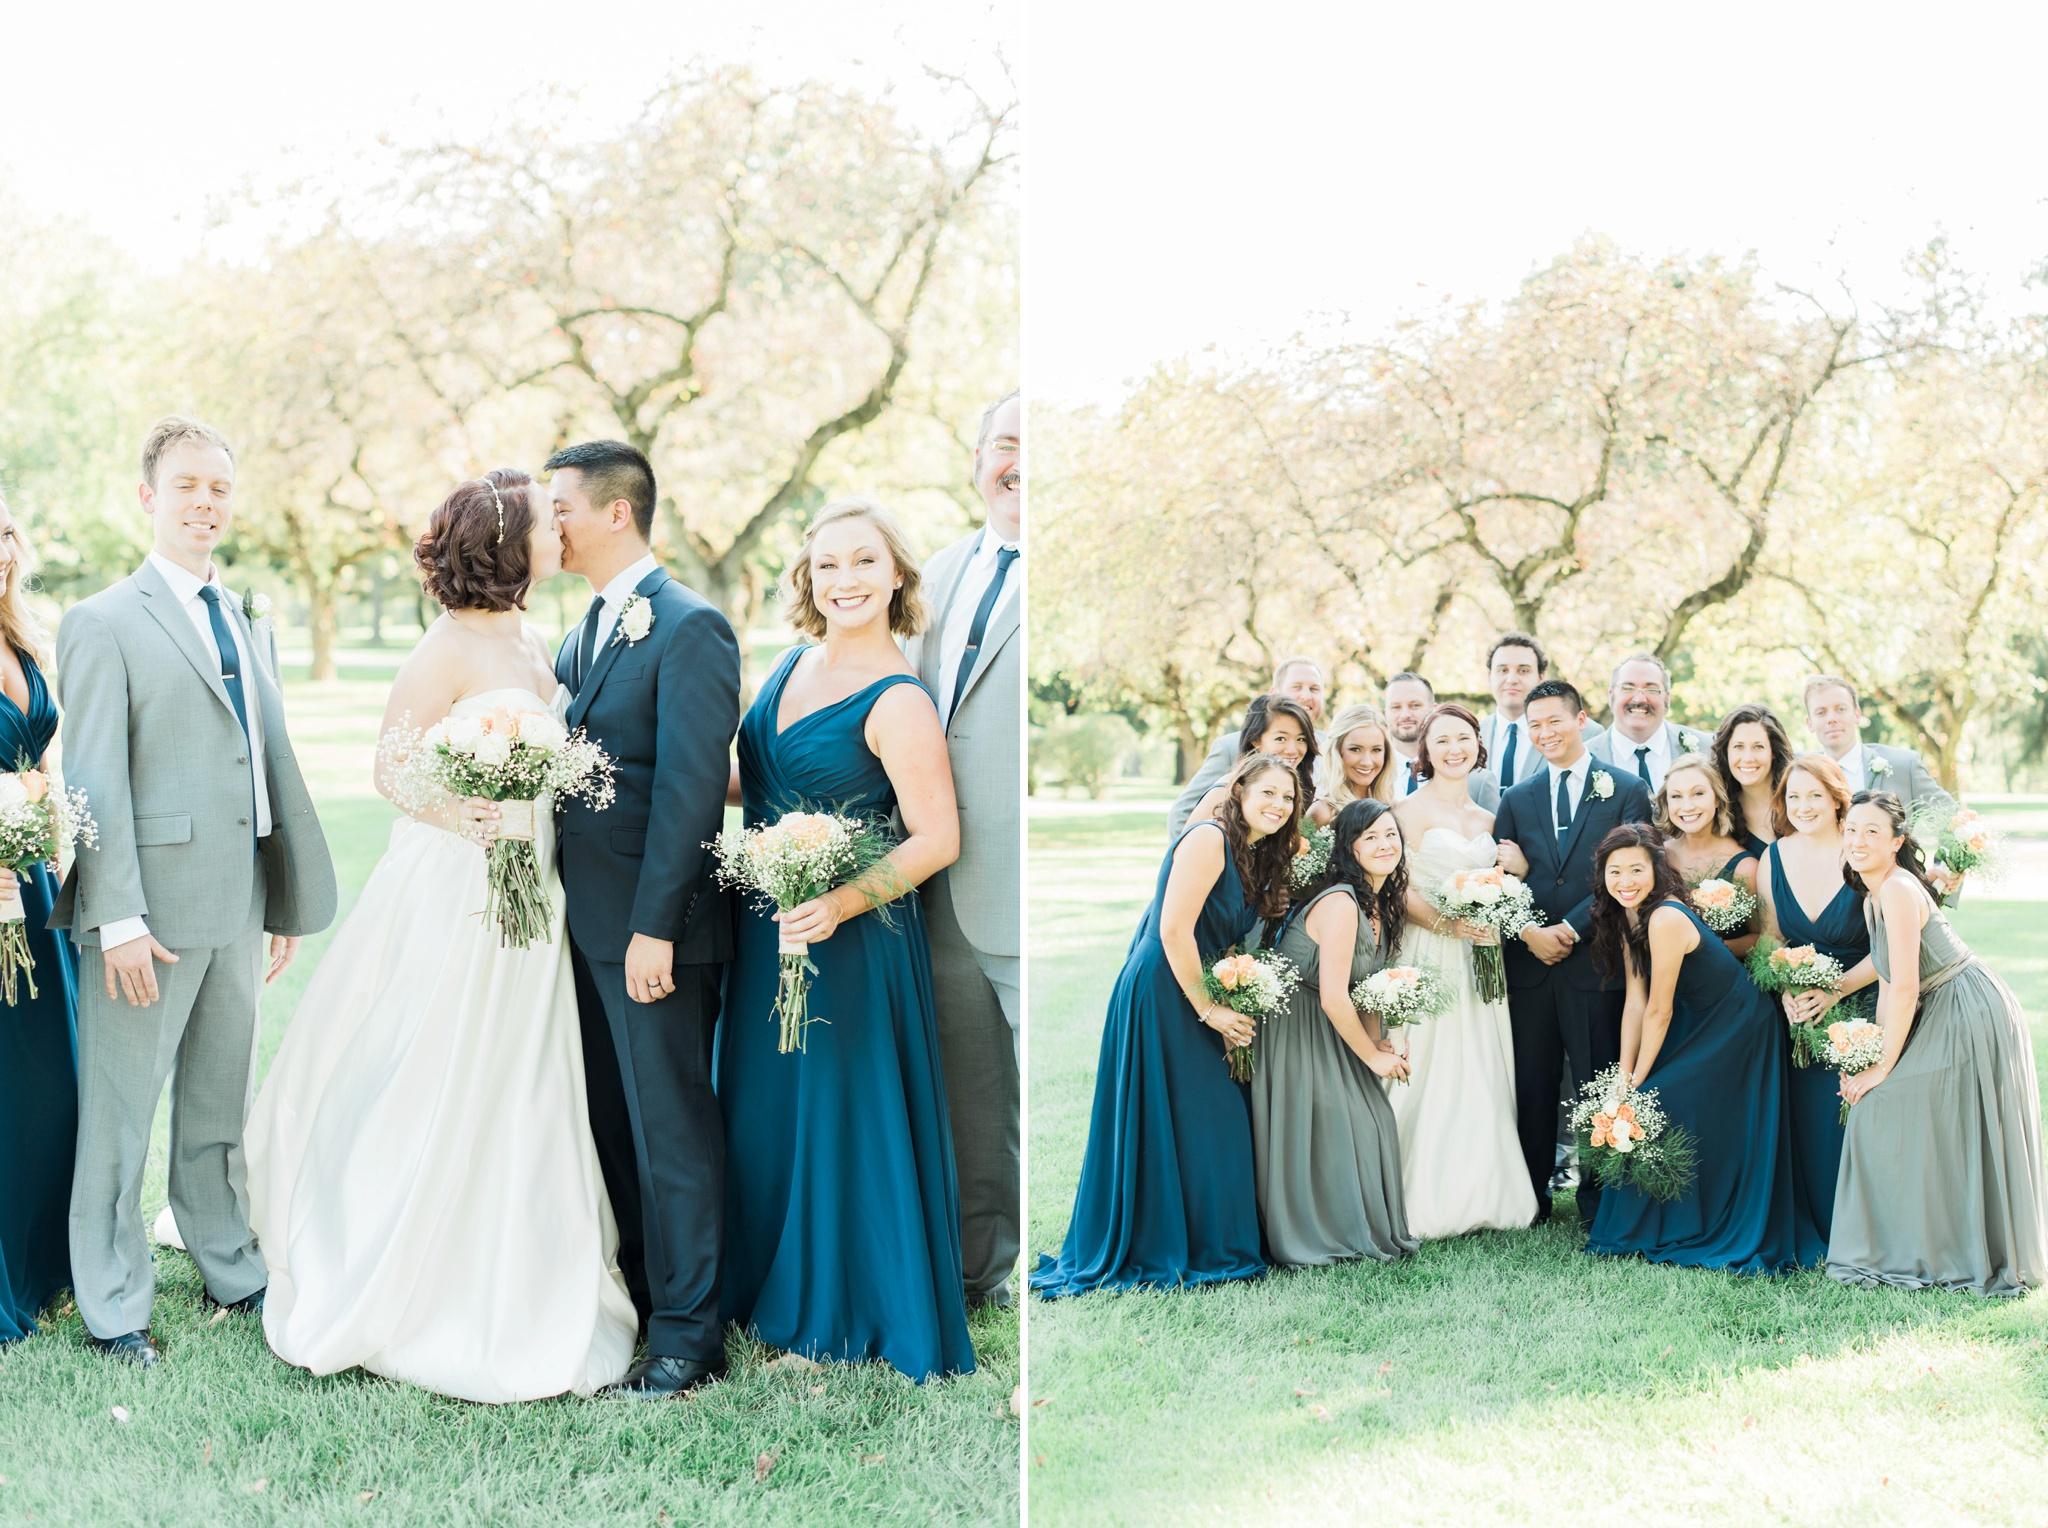 brookside-golf-country-club-wedding-columbus-ohio-77.jpg